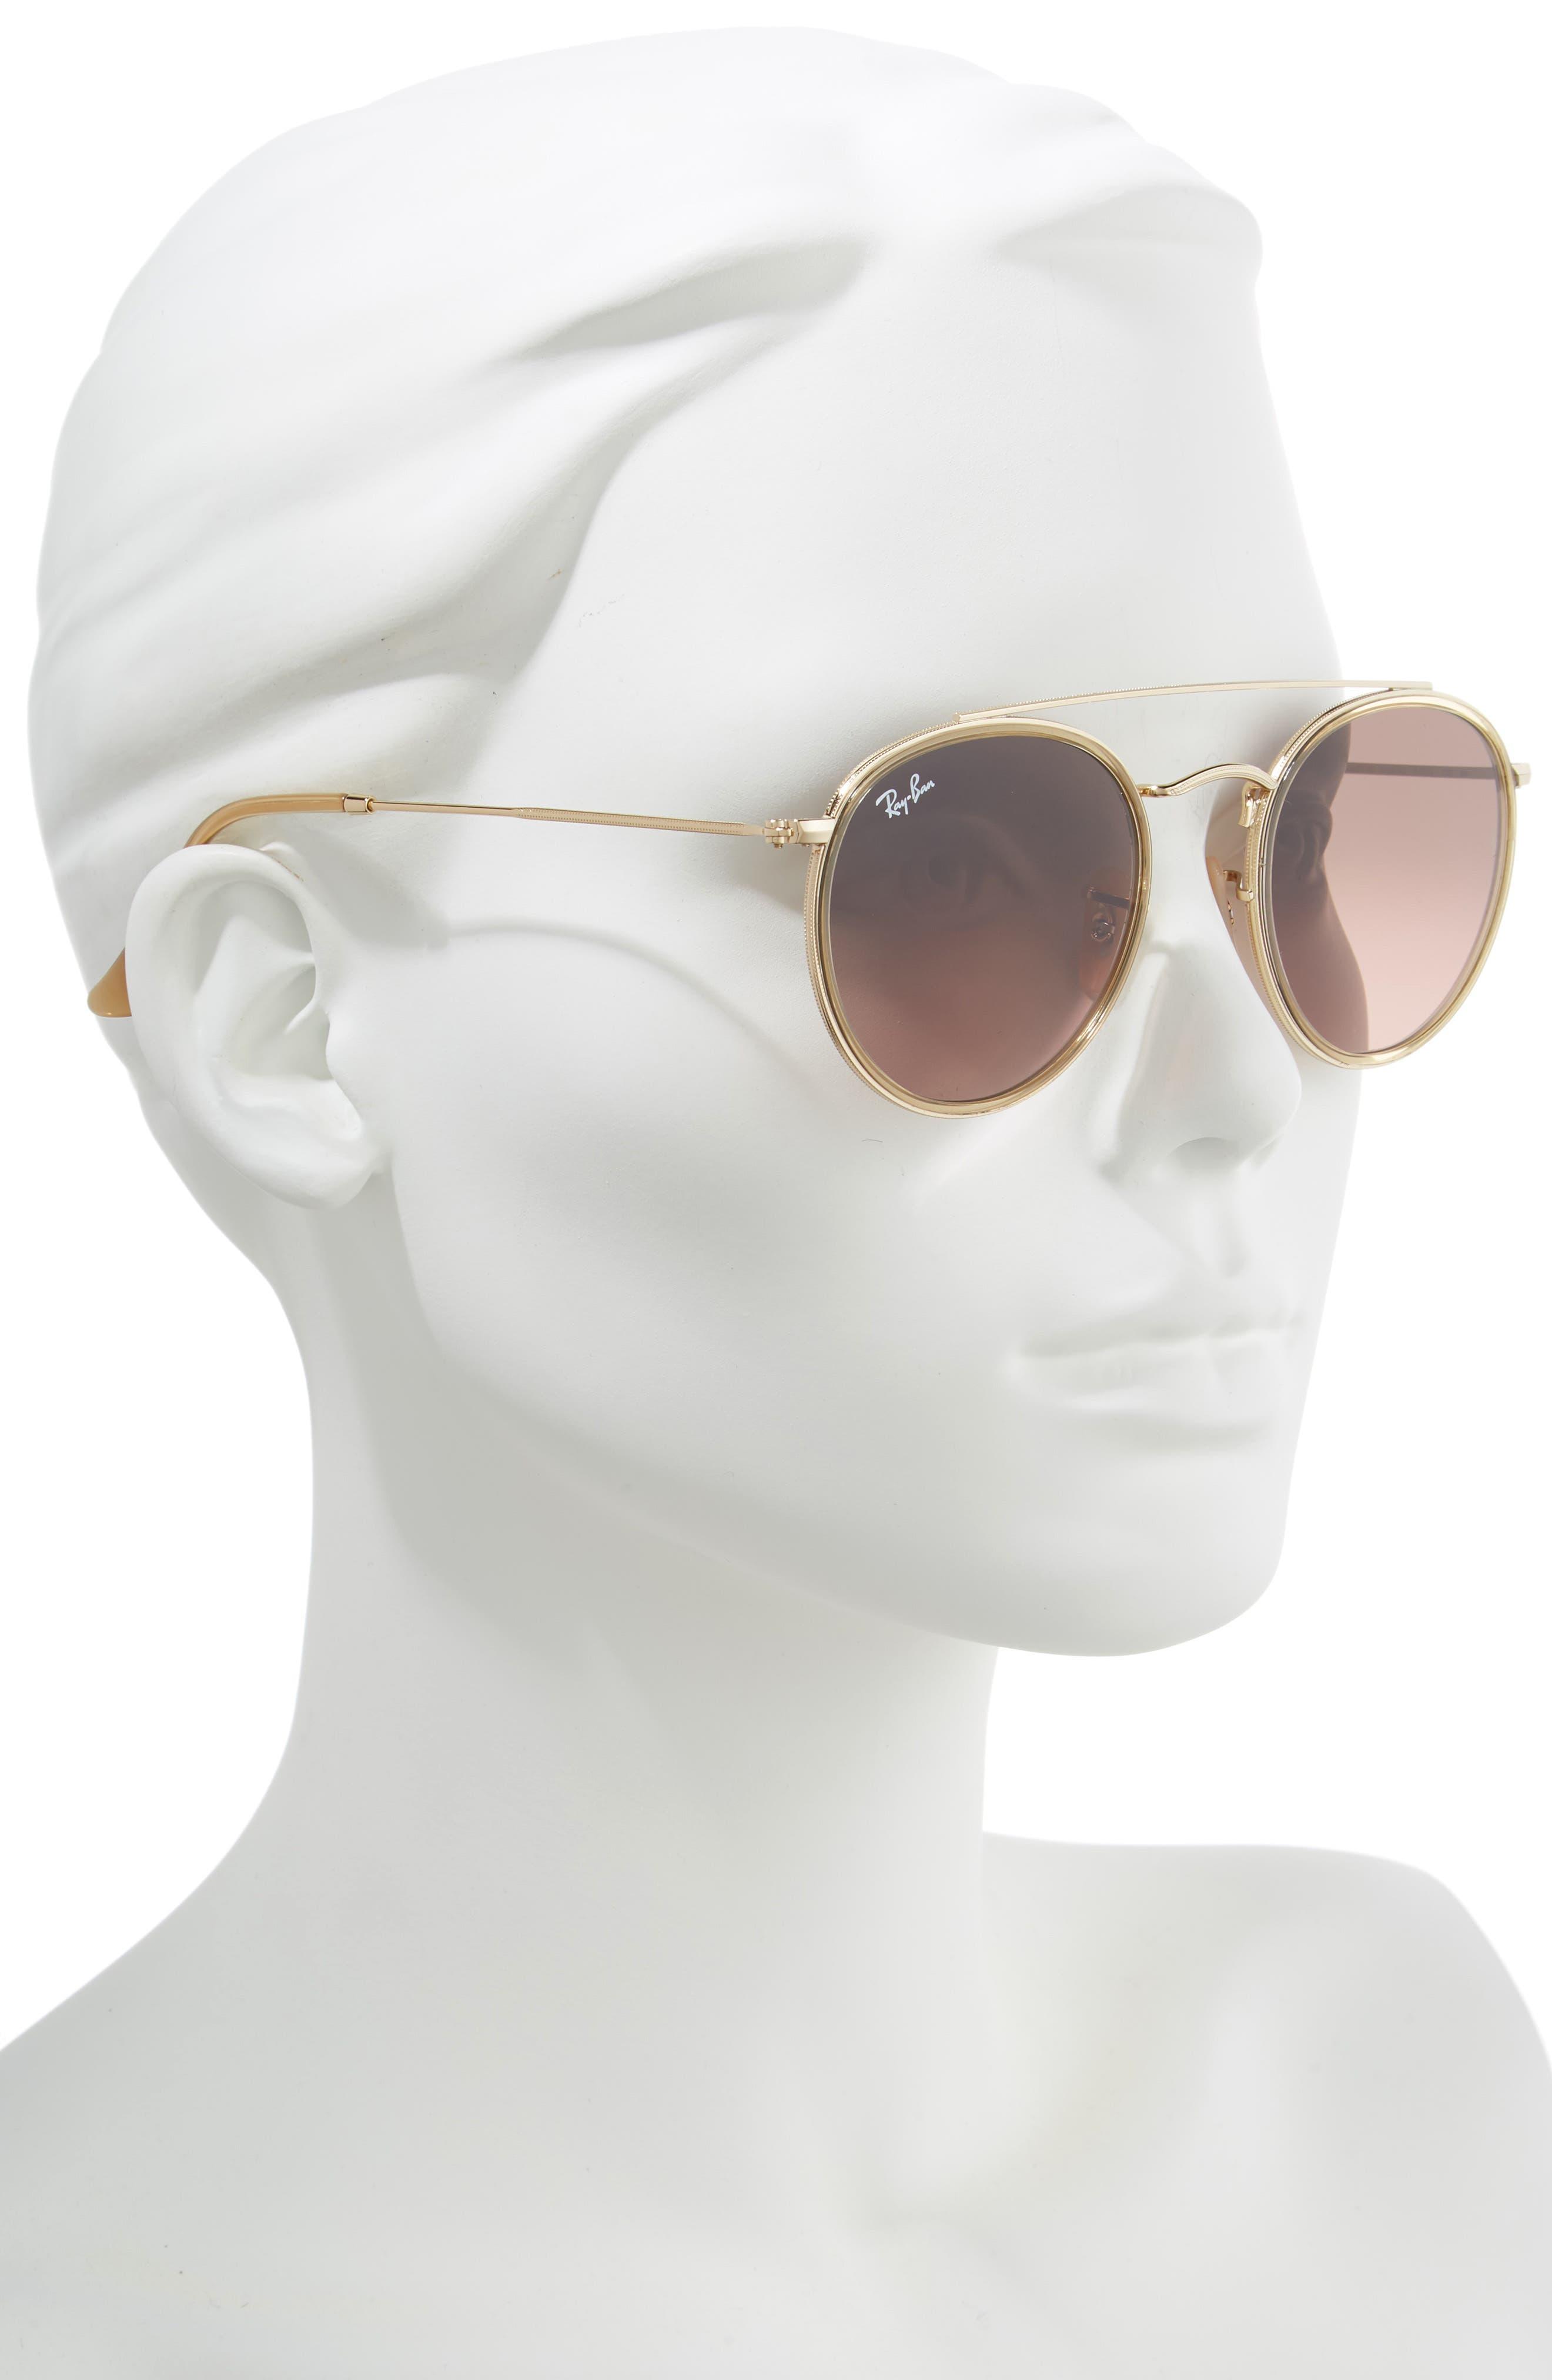 51mm Aviator Gradient Lens Sunglasses,                             Alternate thumbnail 2, color,                             GOLD/ BROWN GRADIENT